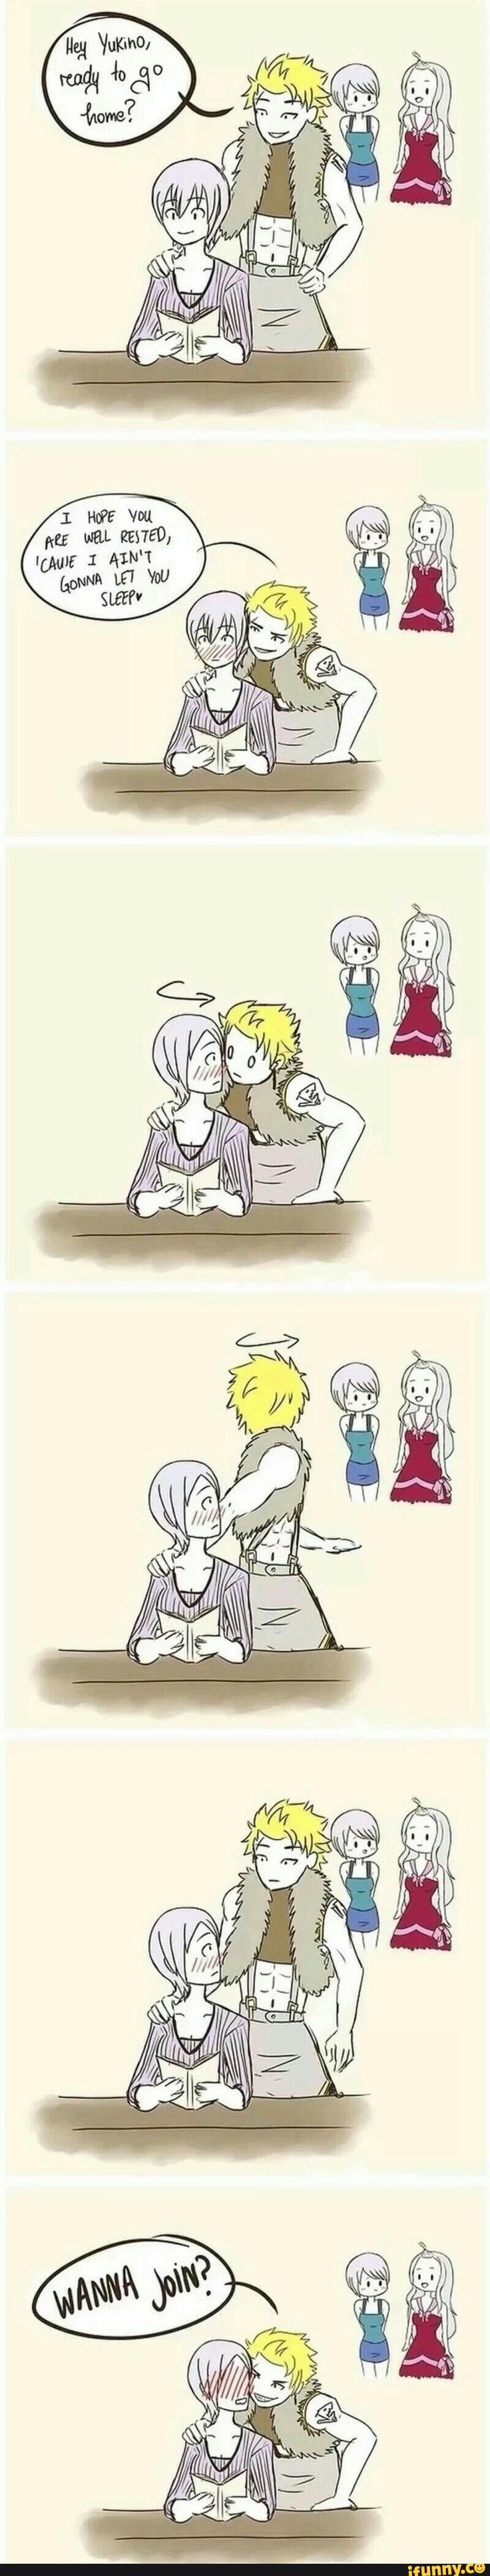 That's so awkward